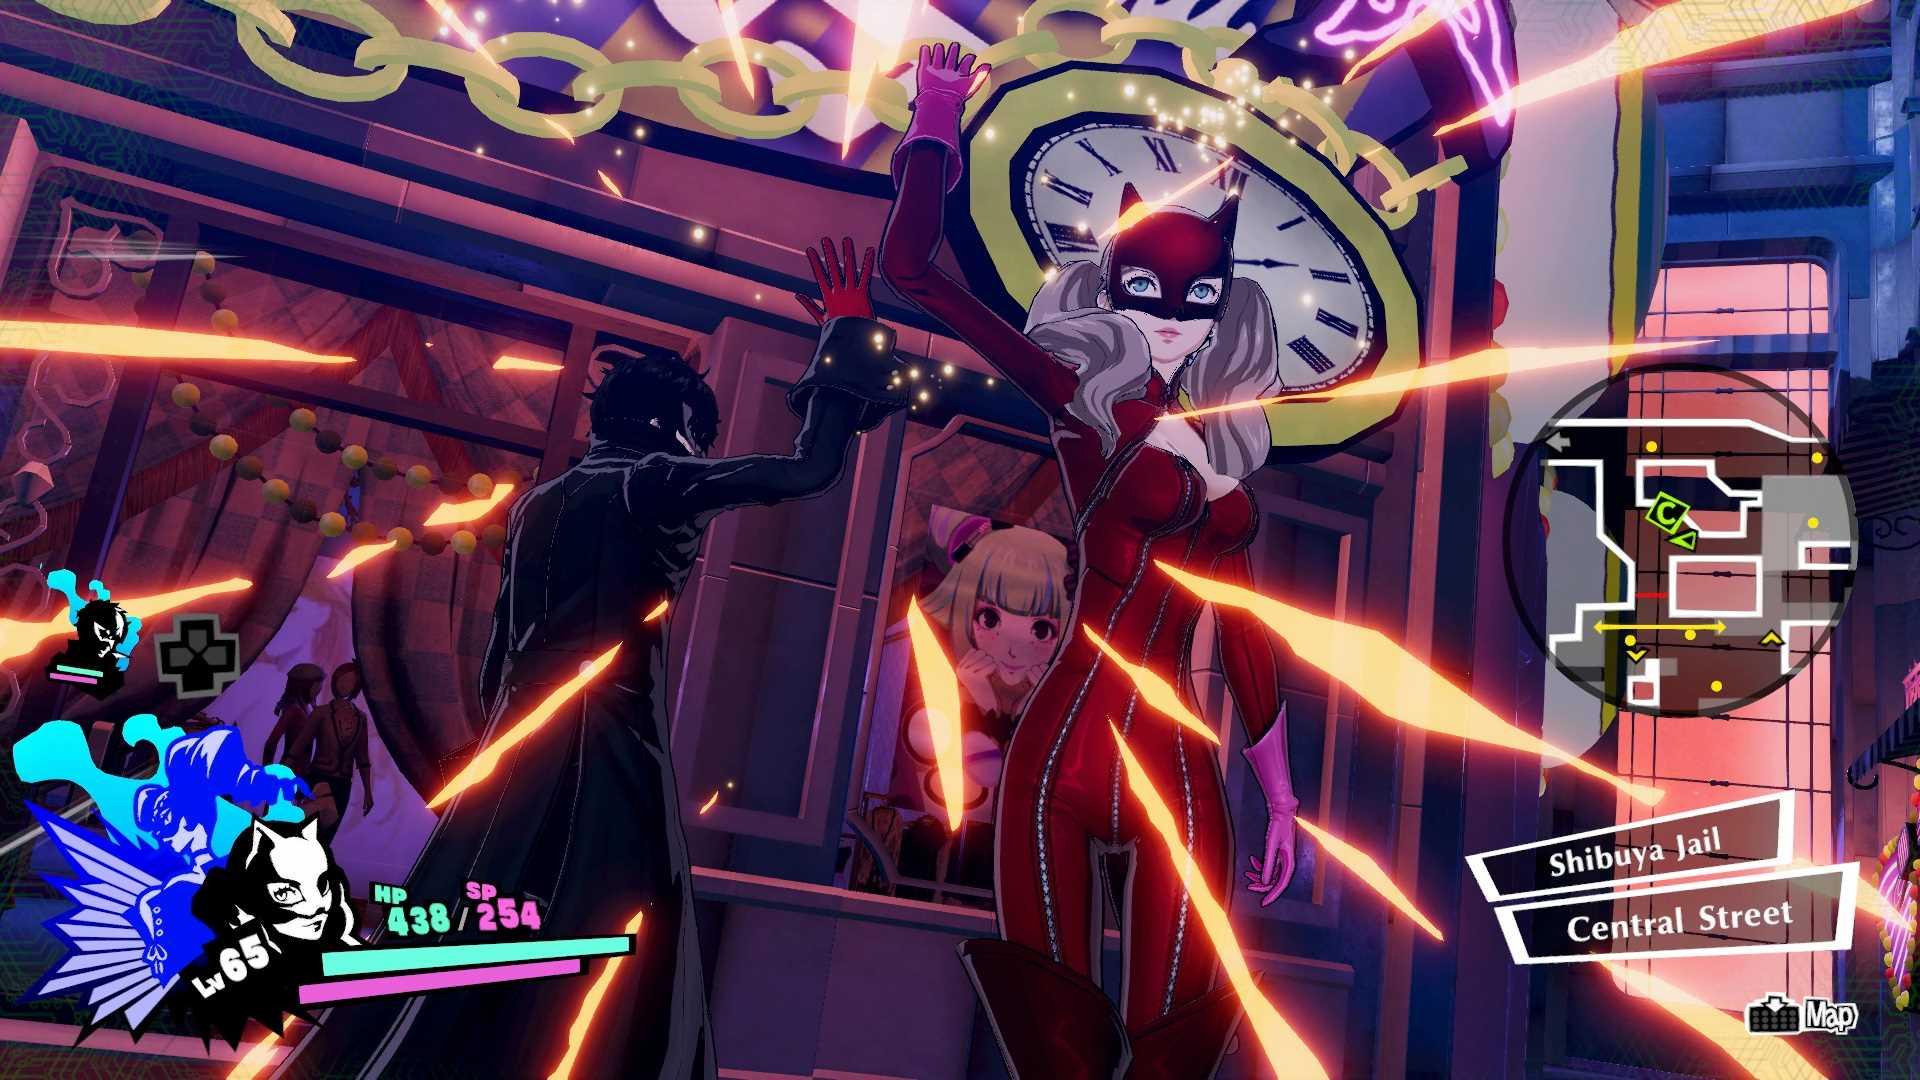 Persona 5 Strikers Cat Suit